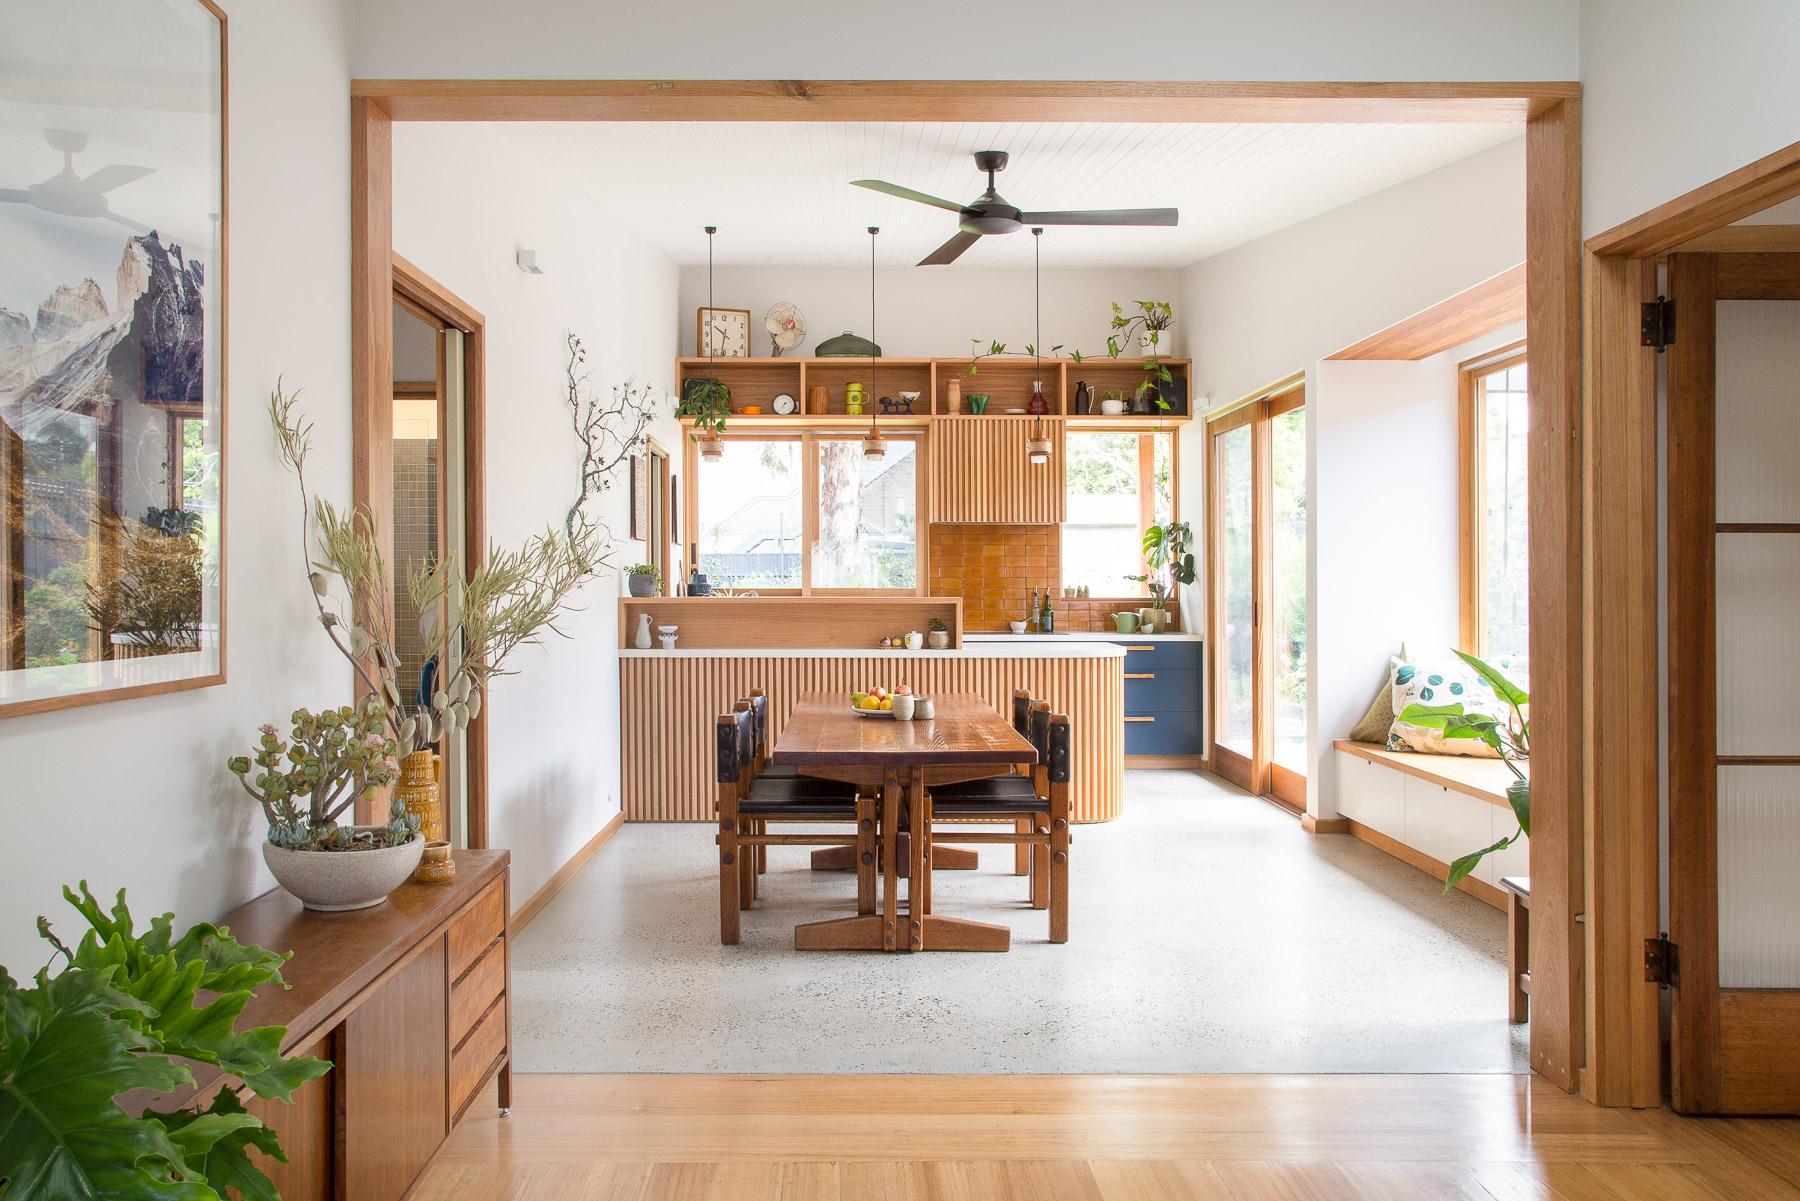 brave+new+eco+sustainable+interior+design (3).jpeg